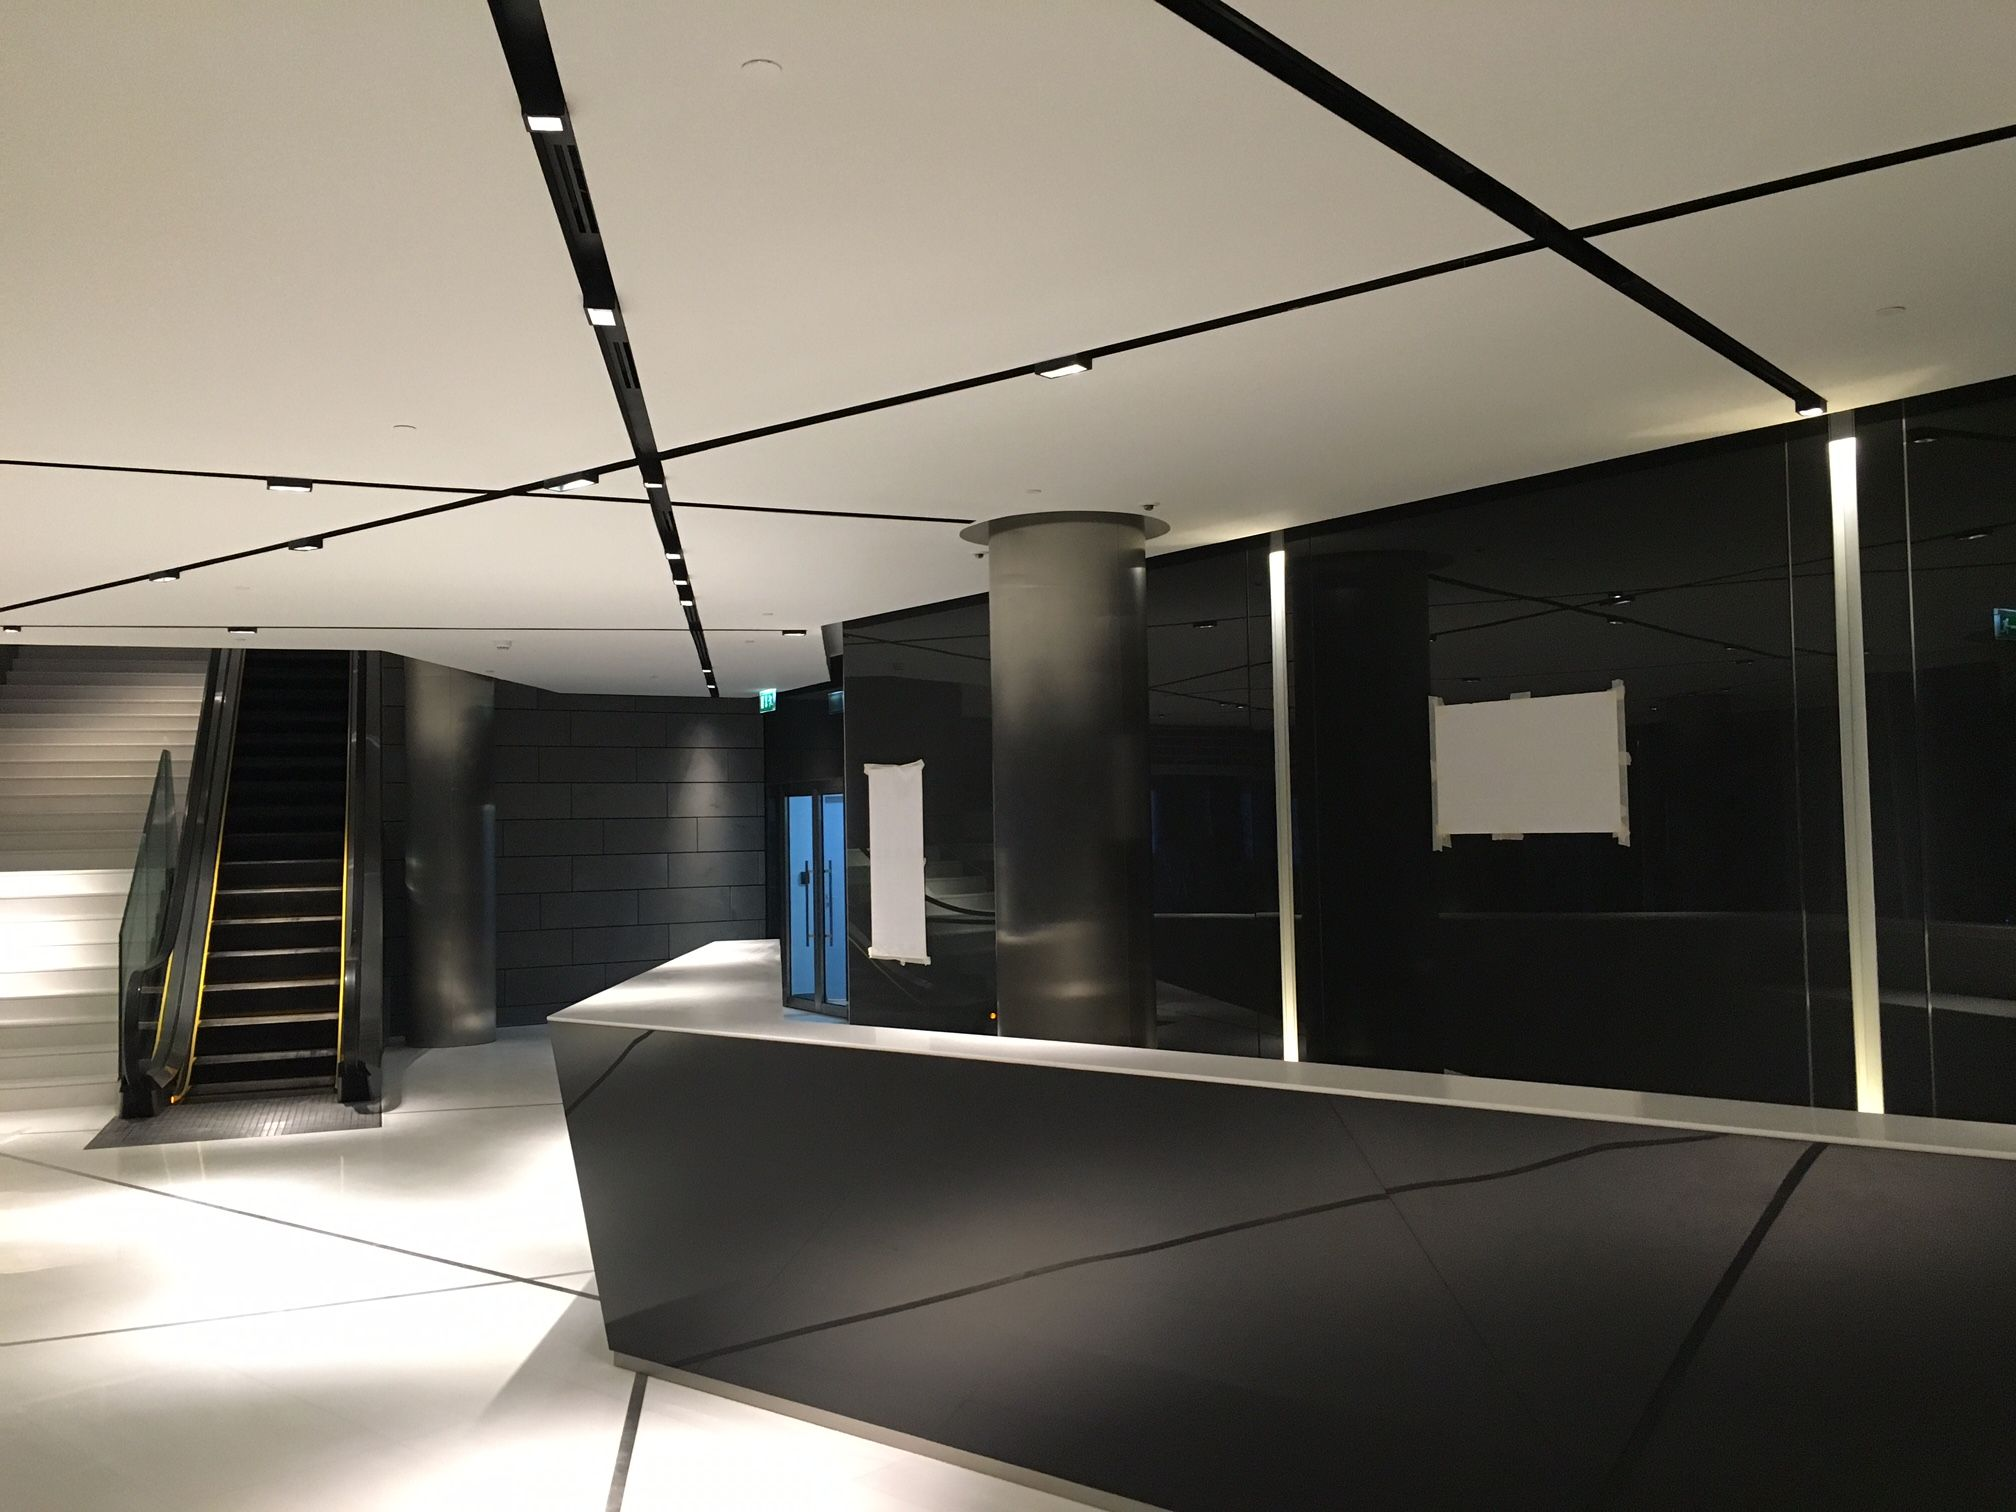 natural lighting futura lofts. Kreon Lighting. Crossed Prologe In-dolma Lighting Profile With Integrated Ventilation Slots. Natural Futura Lofts R